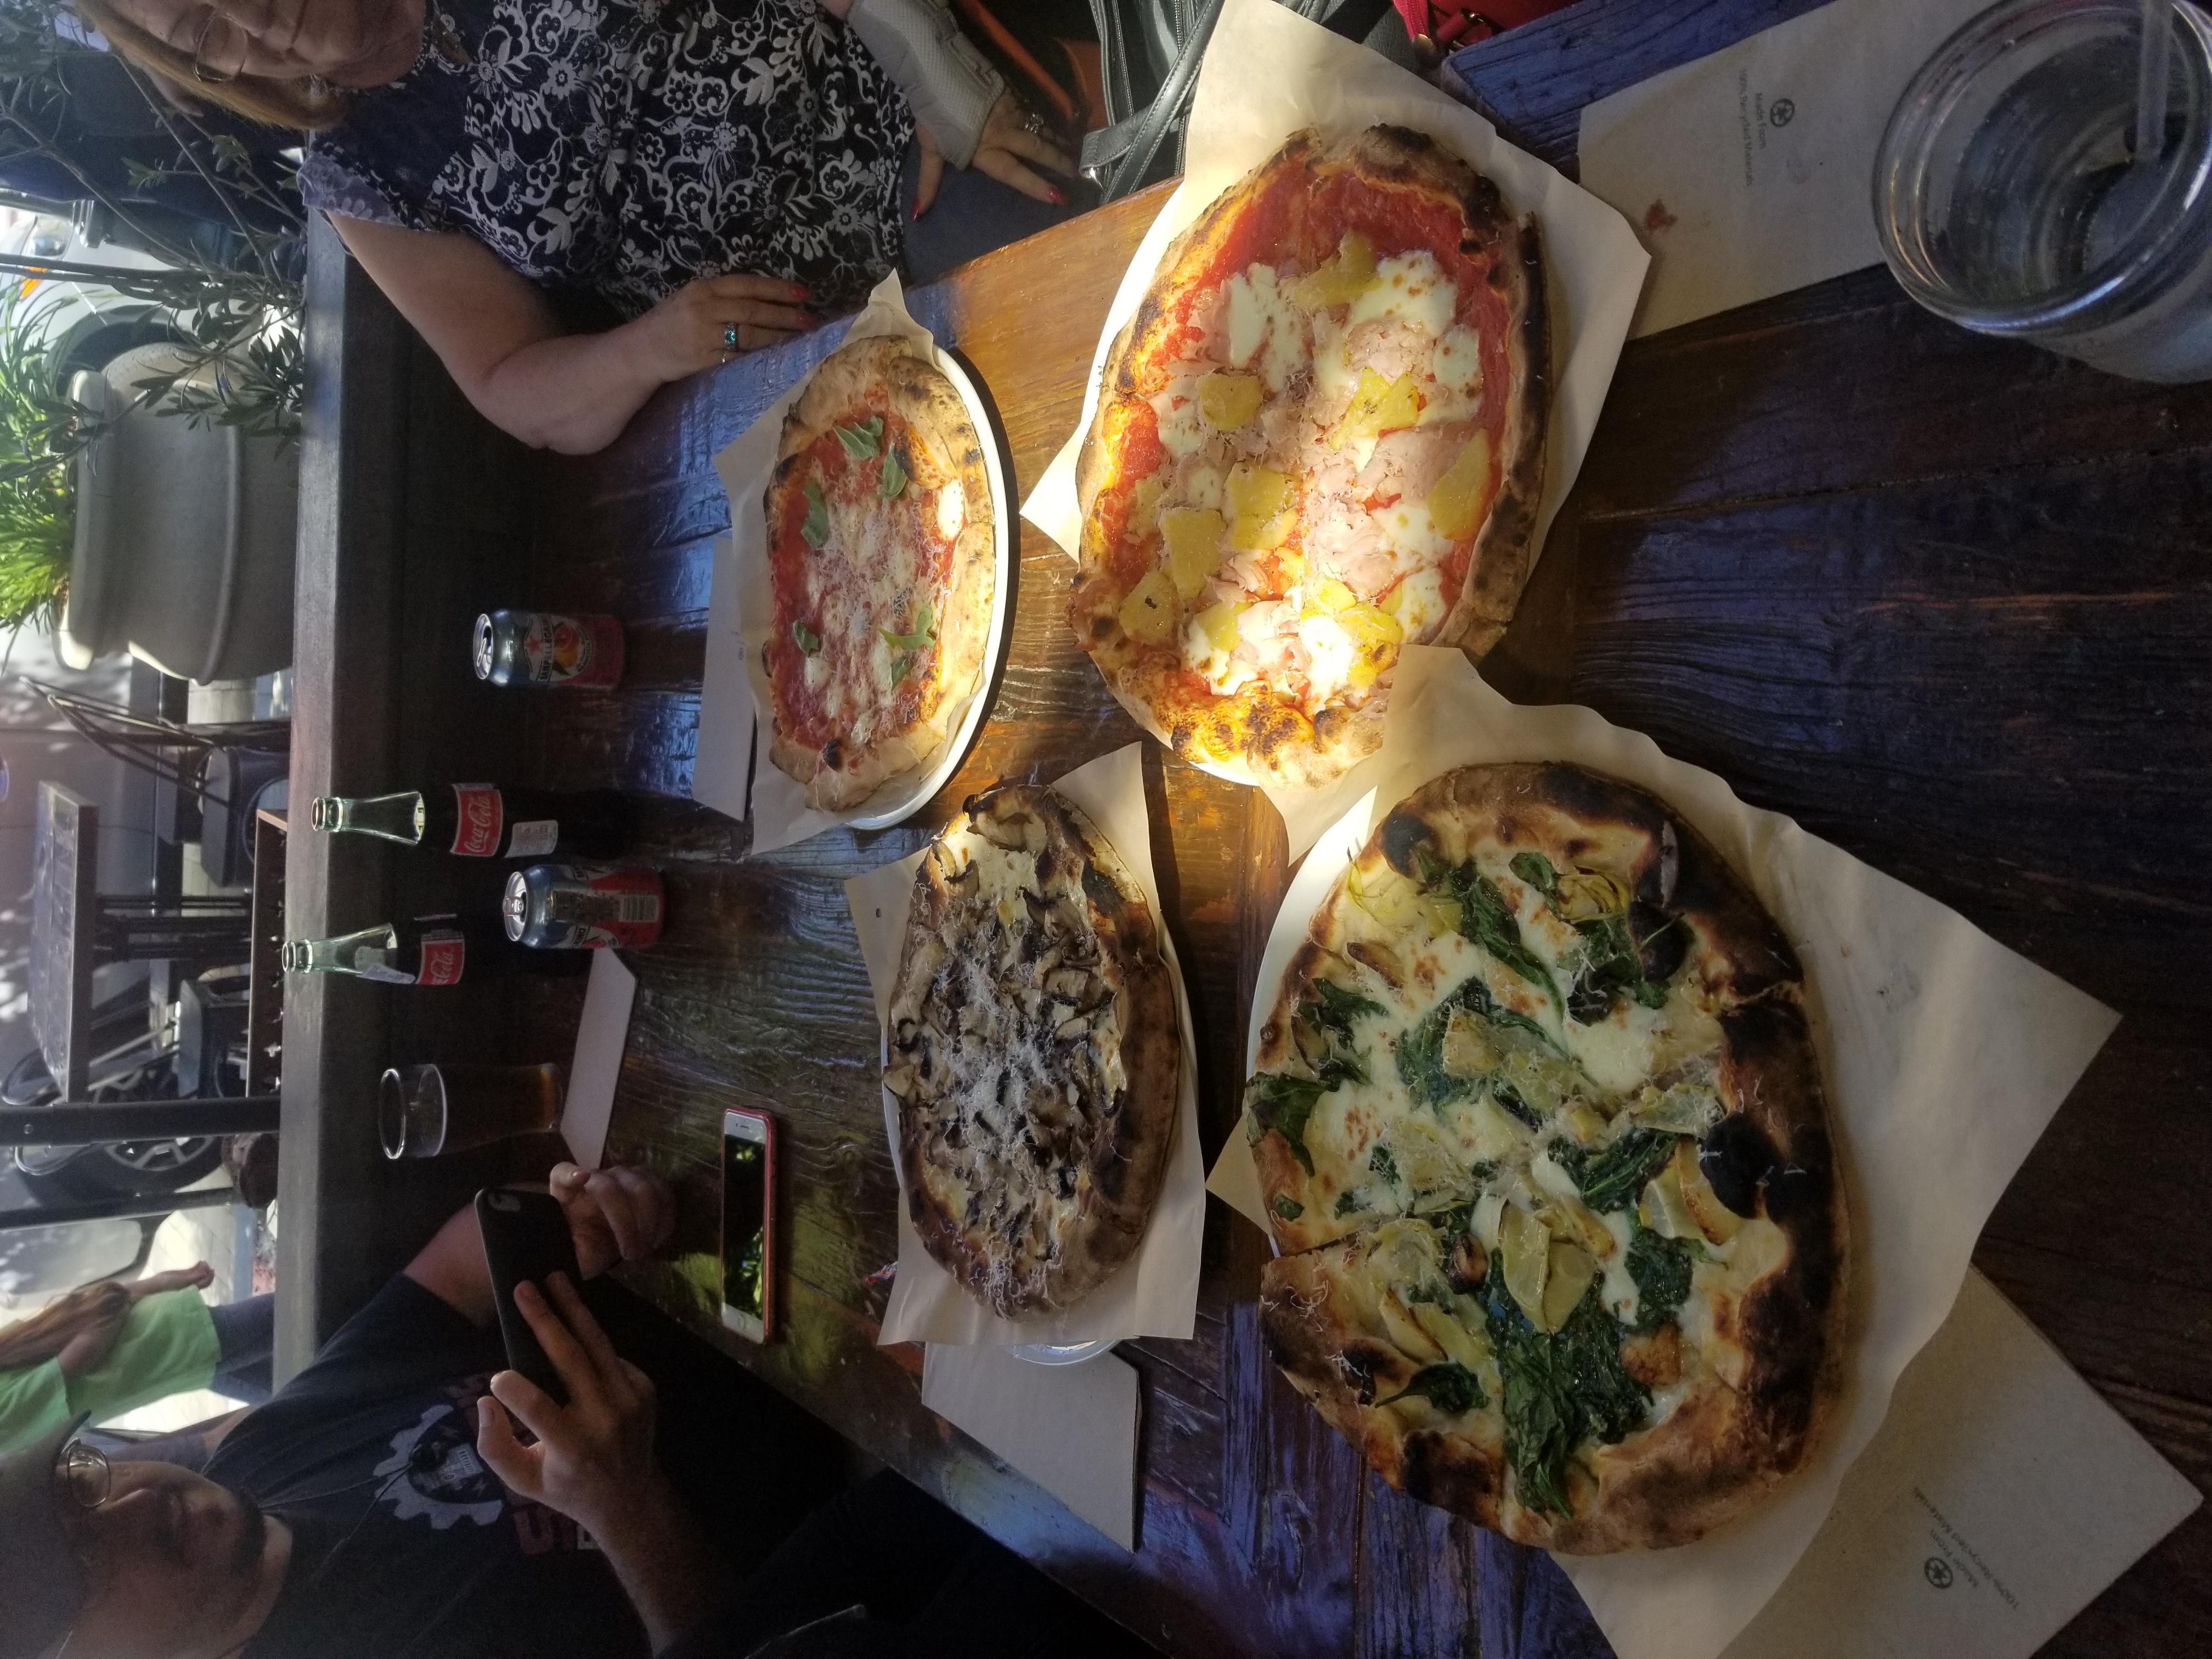 ara.asatourian on One Bite Pizza App